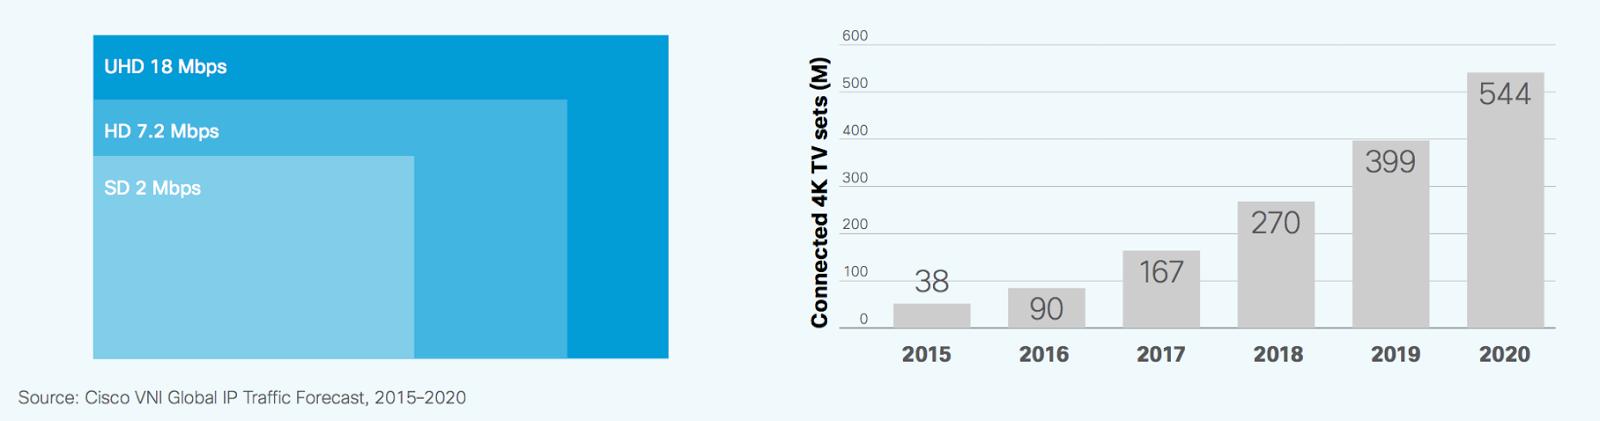 cisco-vni-global-ip-traffic-forecast-2015-2020